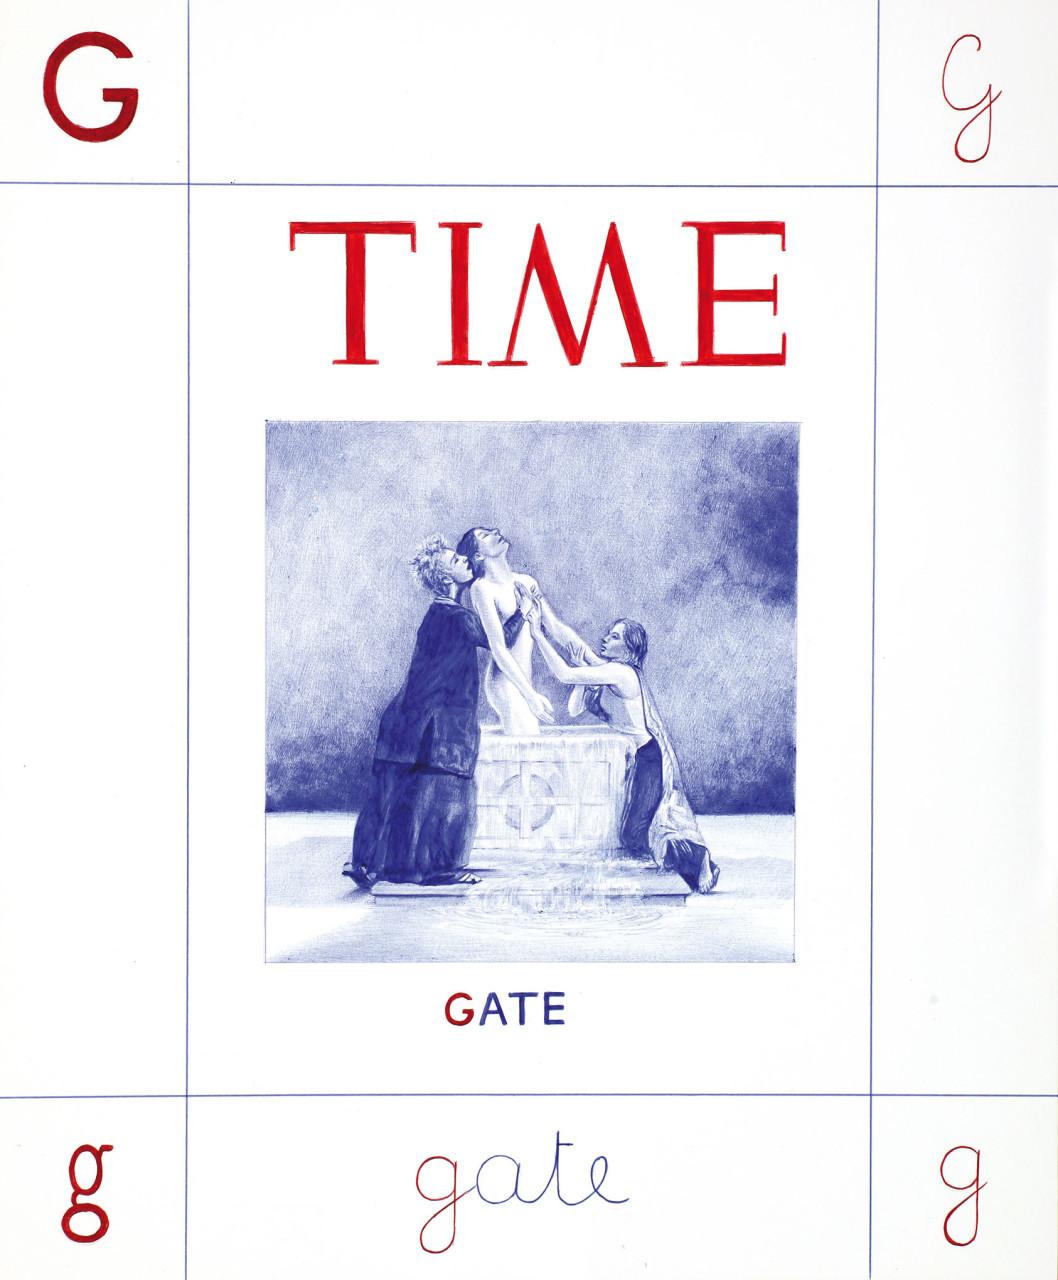 01G-gate_bassa